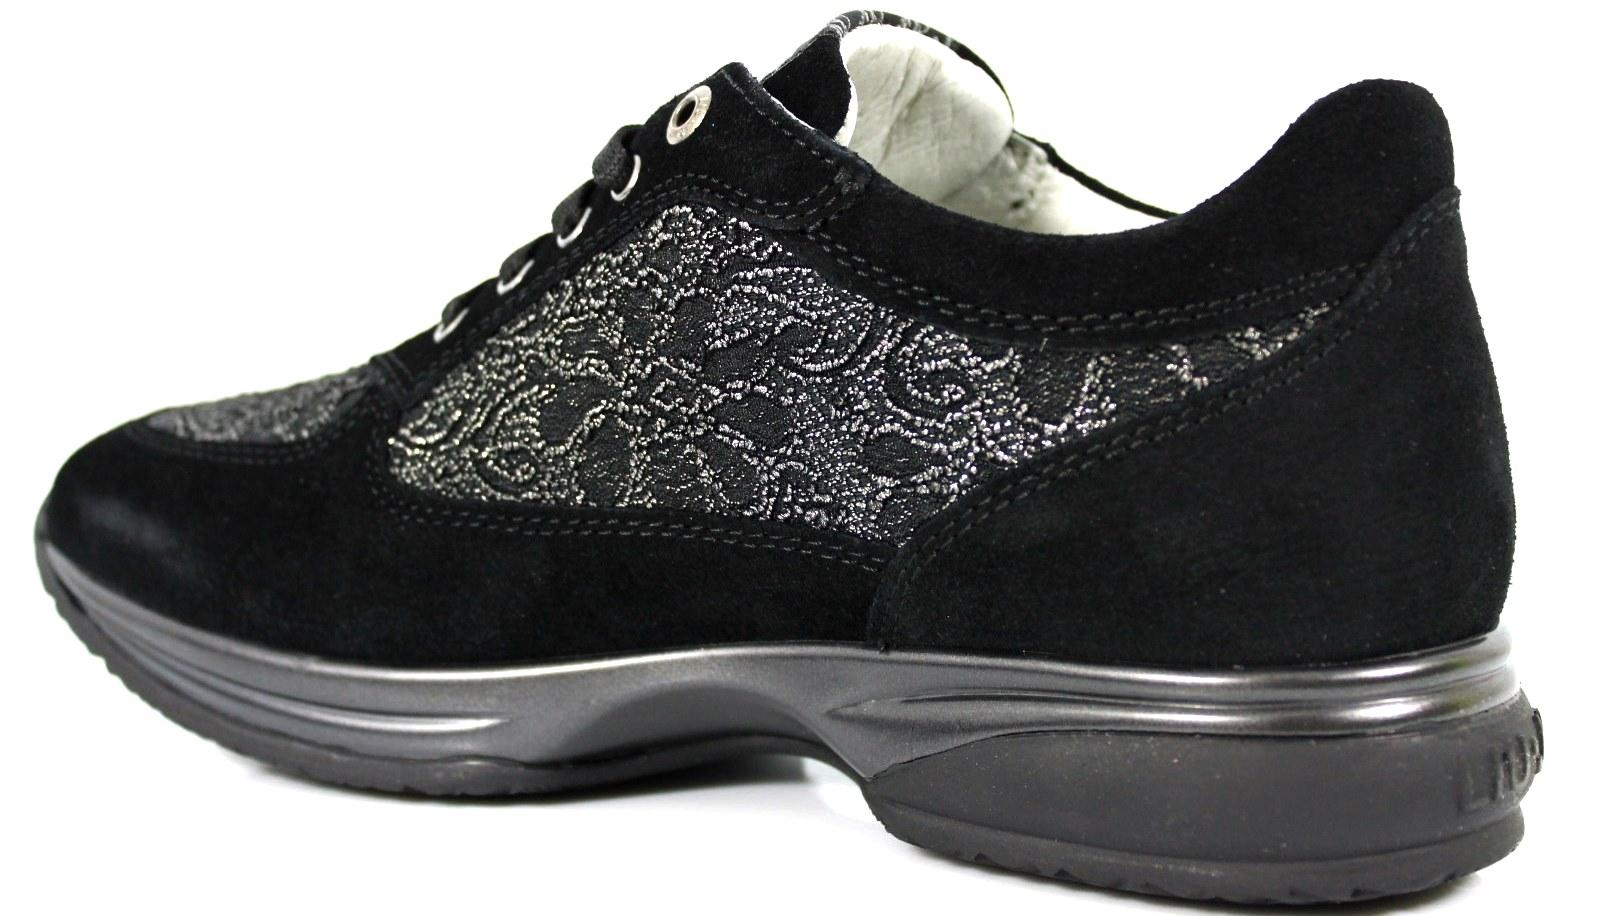 Liu Jo Woman Sneakers UB20828 Scarpe Donna Bambina Zeppa Calzature Woman  Shoes. codice  LiuJoGirlUB20828Nero 9e3e7e07a2b